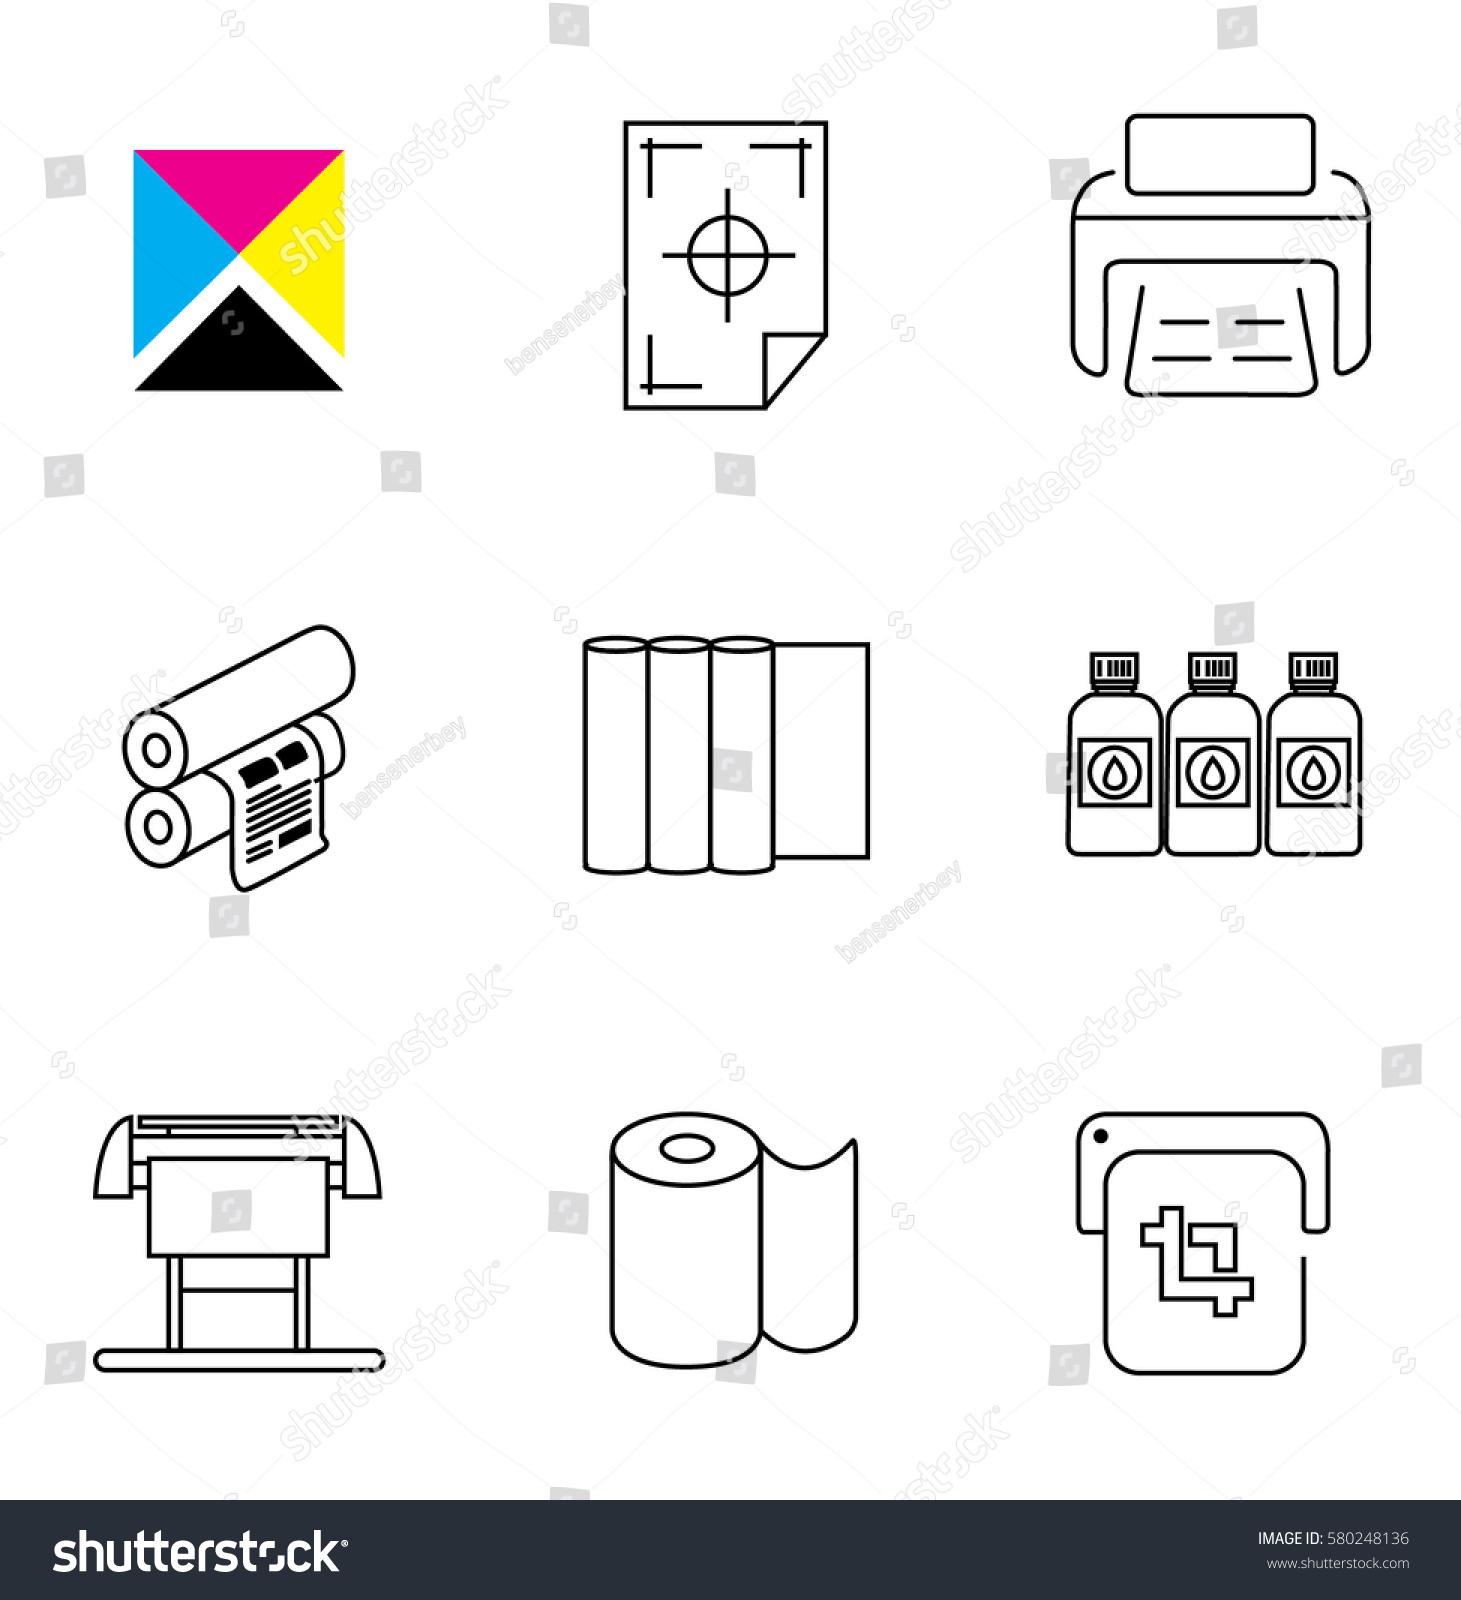 Print Shop Digital Printing Icon Set Stock Vector ...